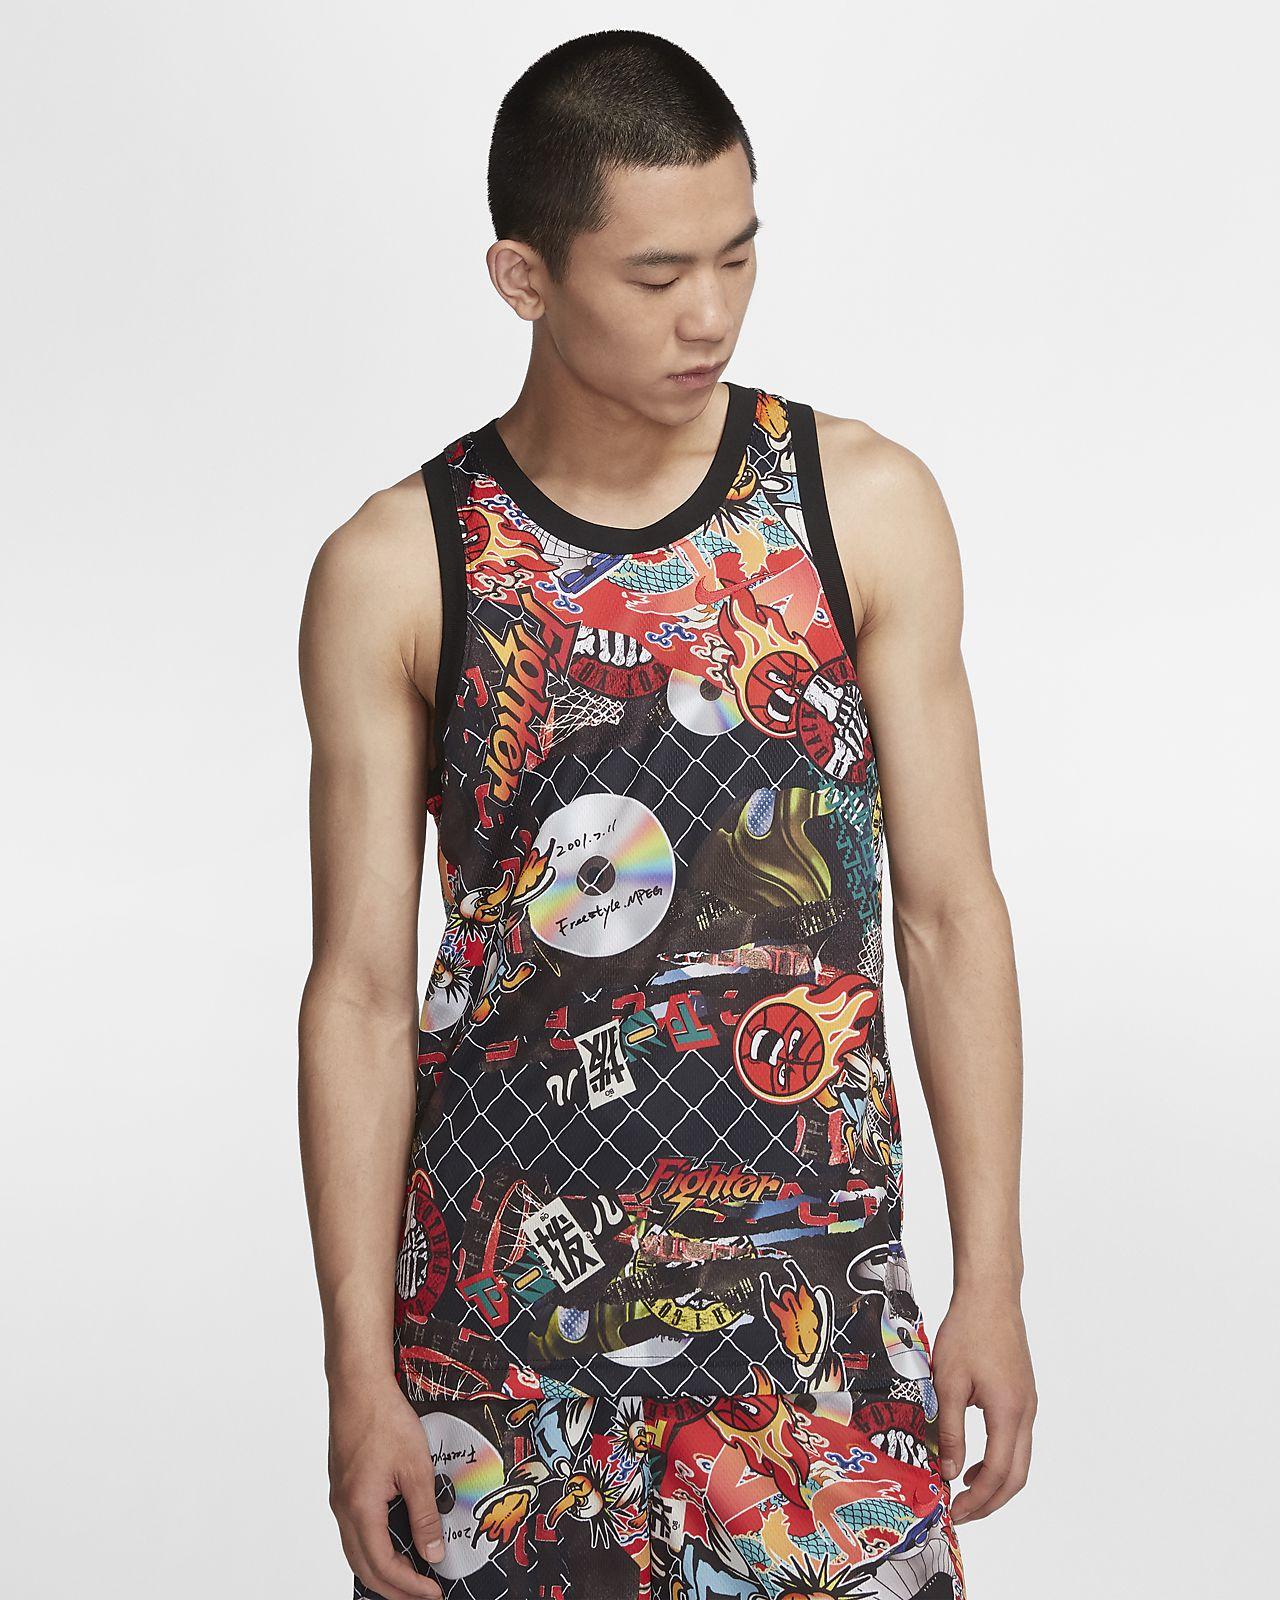 Nike Hoop Dream 男子印花篮球背心